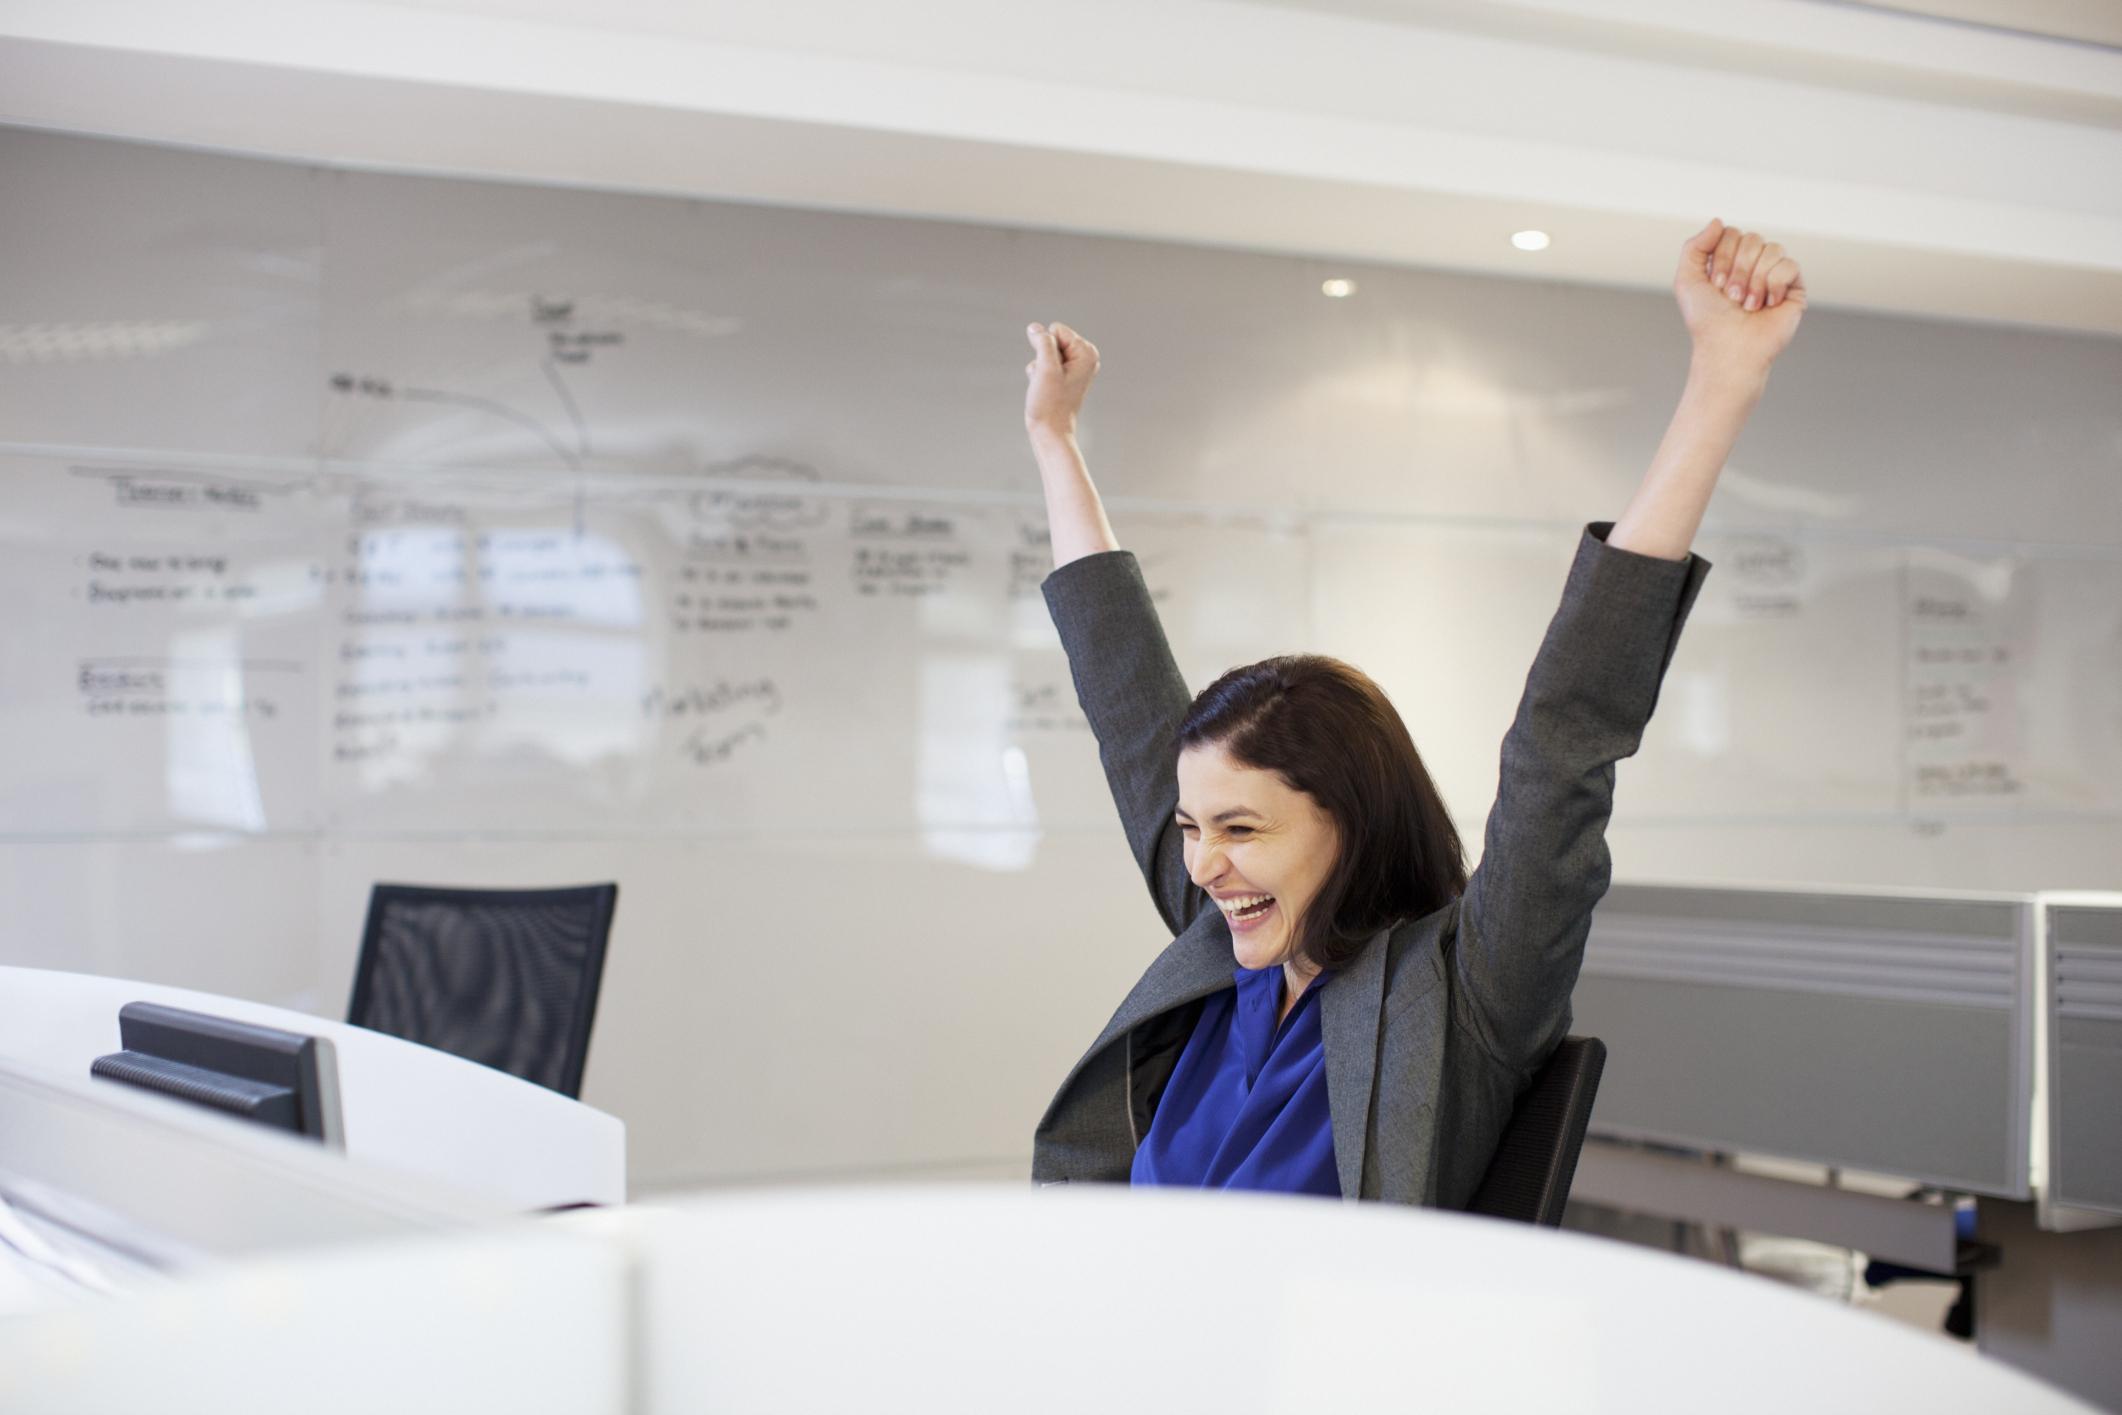 A woman raises her arms in triumph.